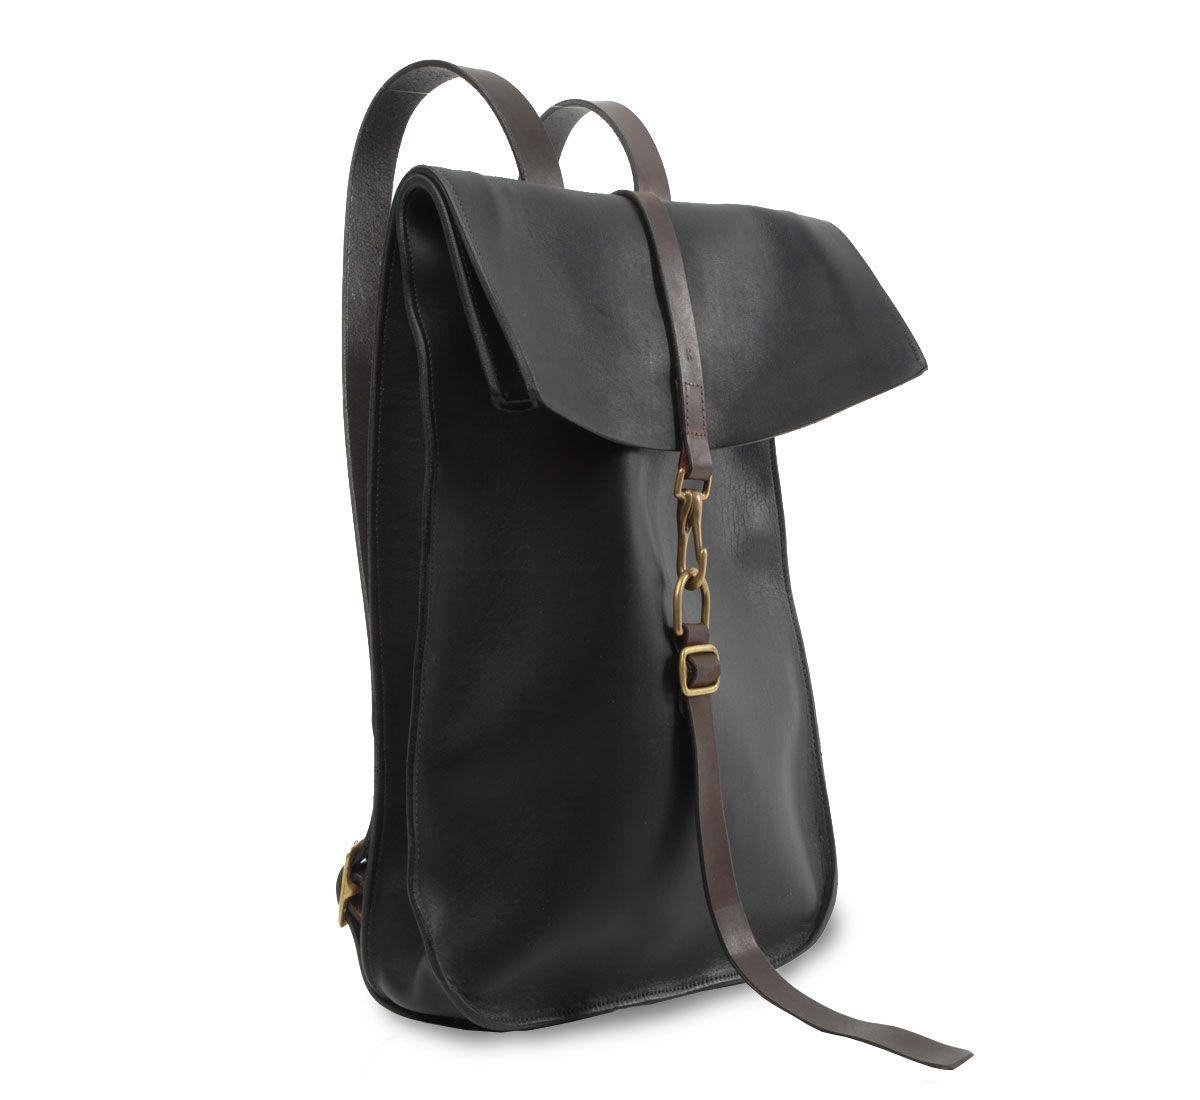 black and walnut postal backpack by kika ny ::Roztayger :: Designer Handbags & Accessories